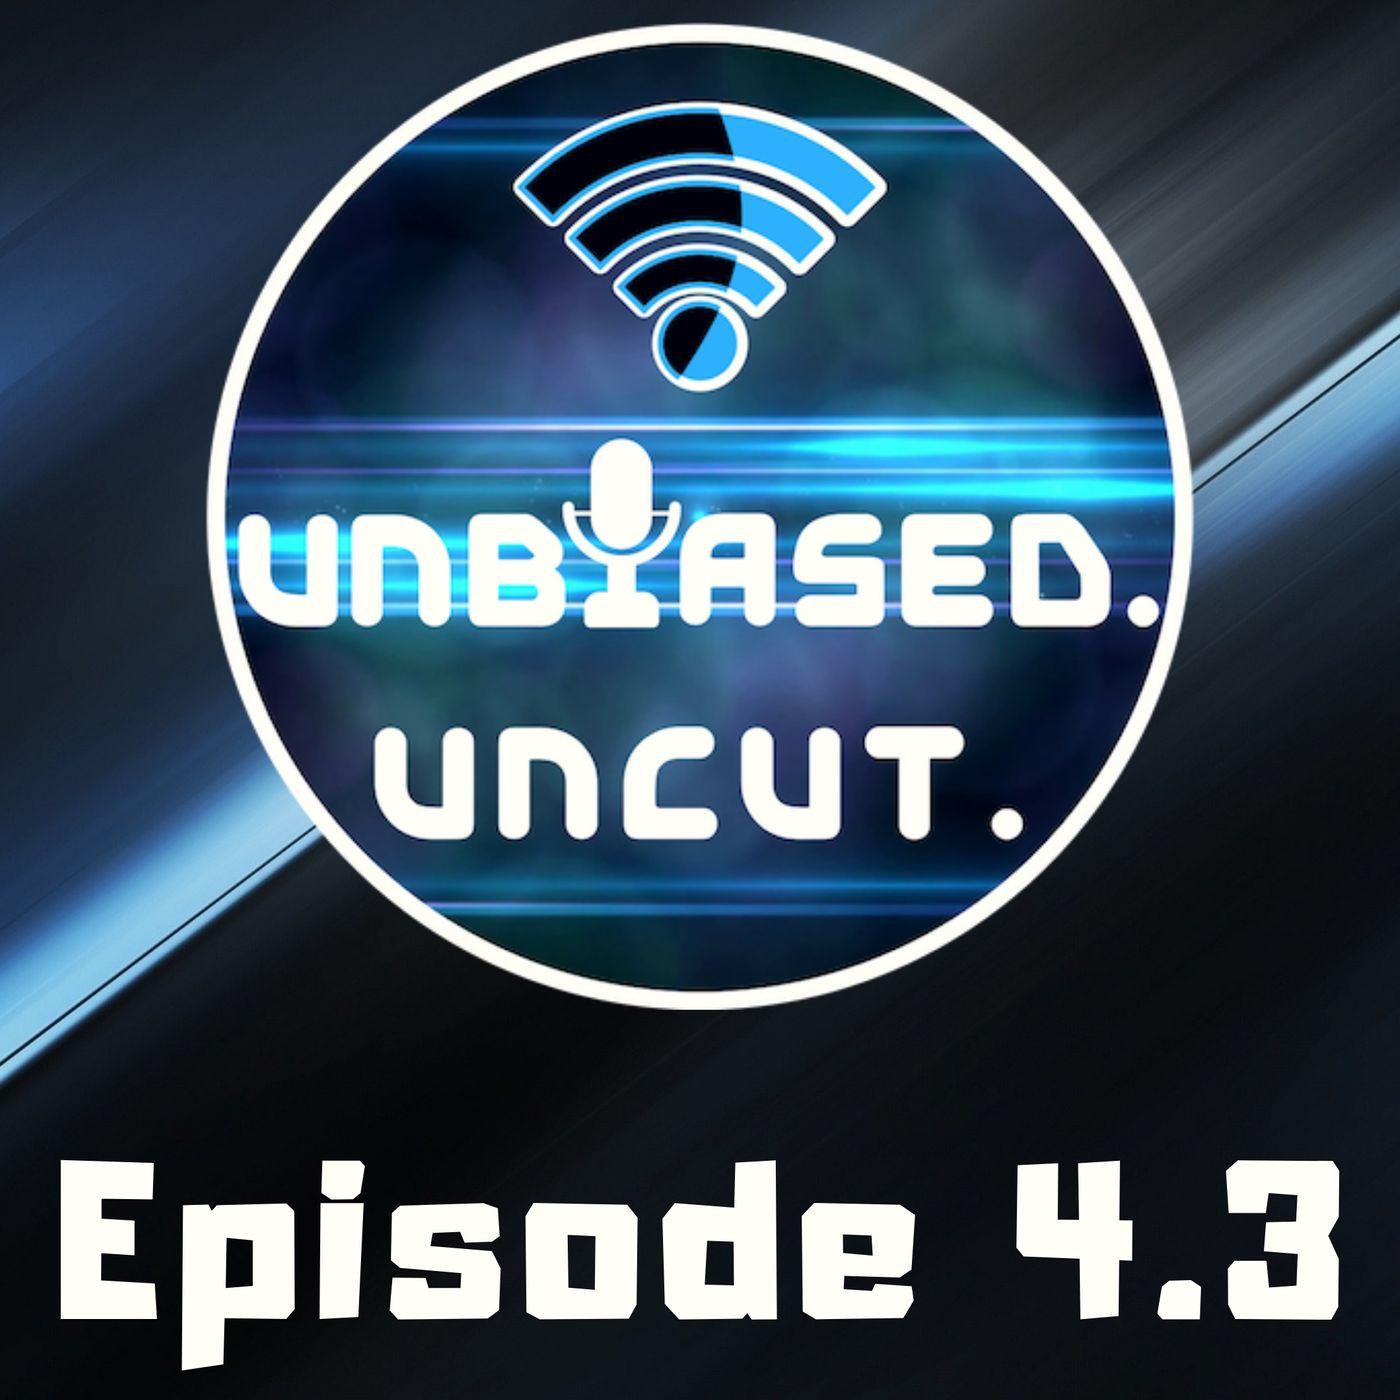 Episode 4.3: Athletic Social War Ground